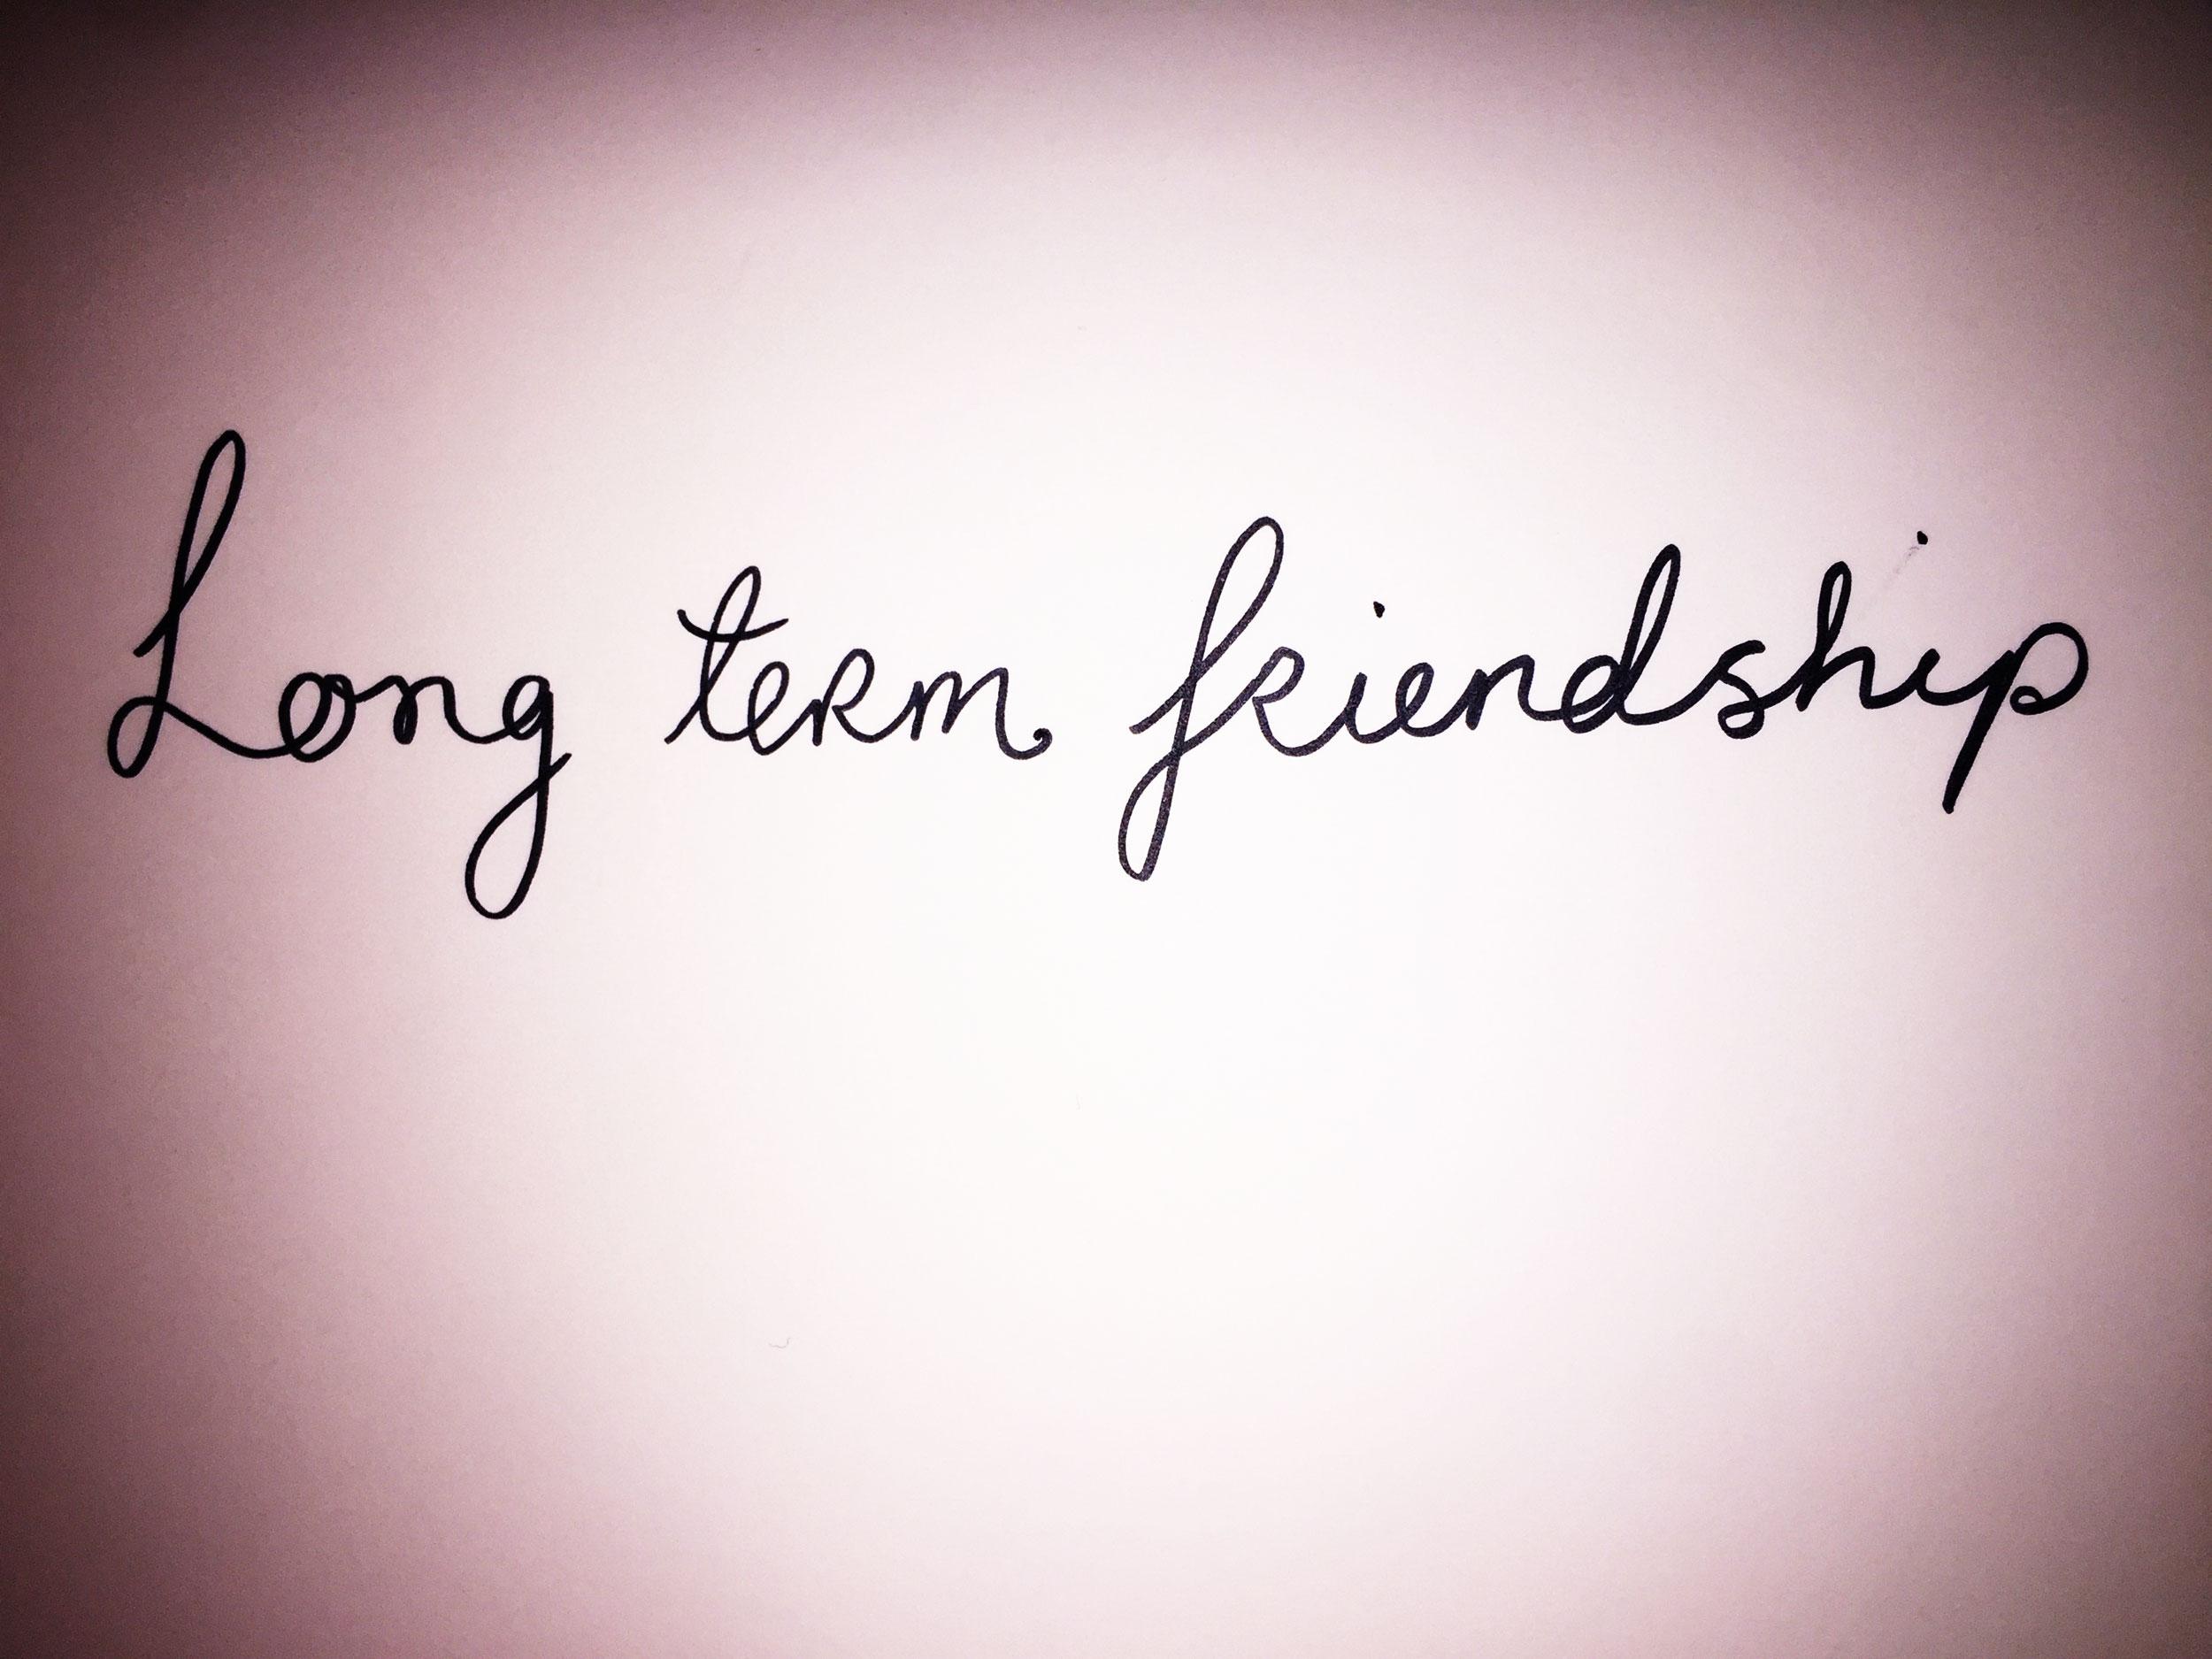 Long term friendship. Drawing Luke Hockley.